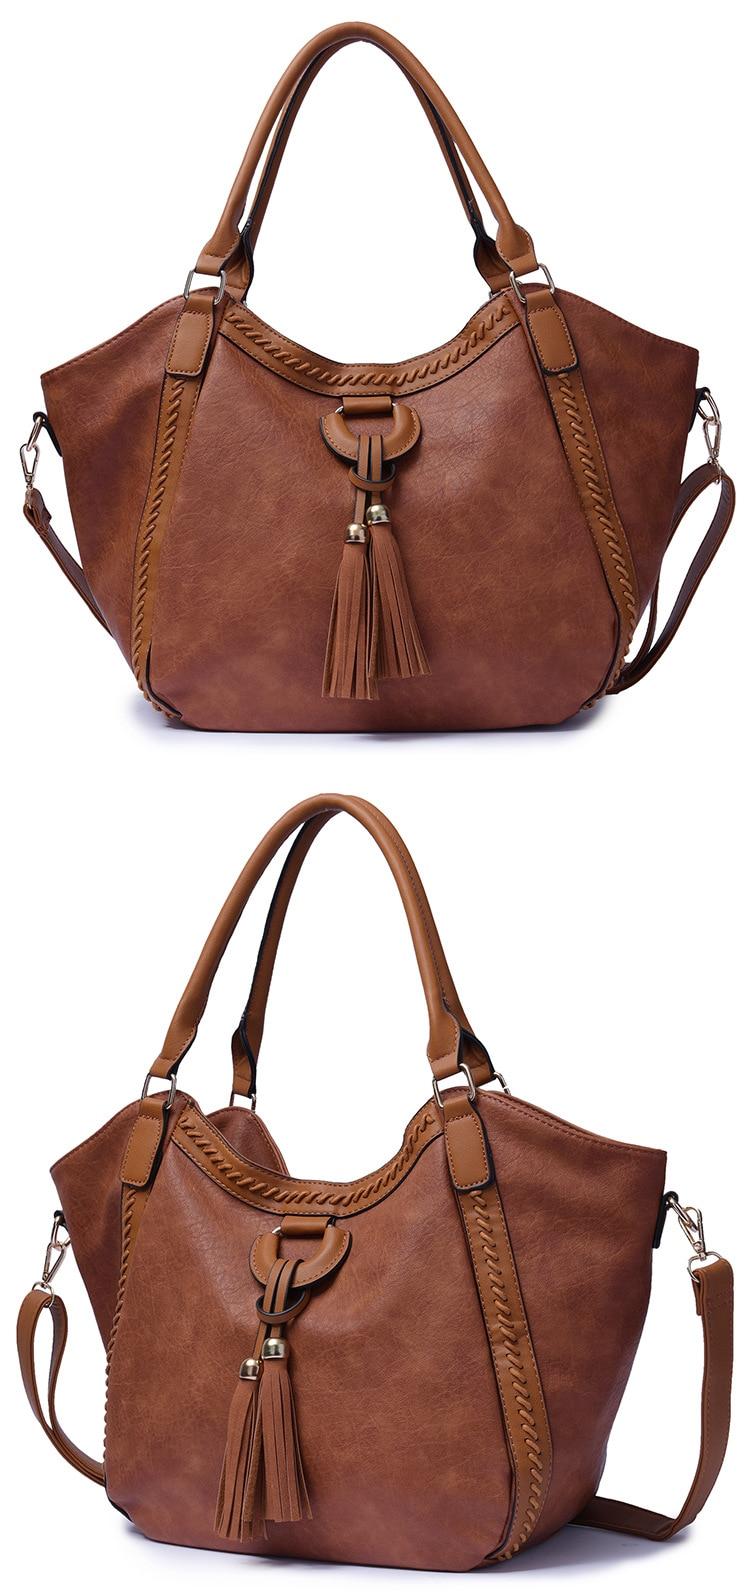 NIGEDU Leather Casual Tassel Handbag Large Famous Brands Designers Pu Leather Handbags Women Big Tote Bags Female Messenger Bags Bolsos Blue (9)